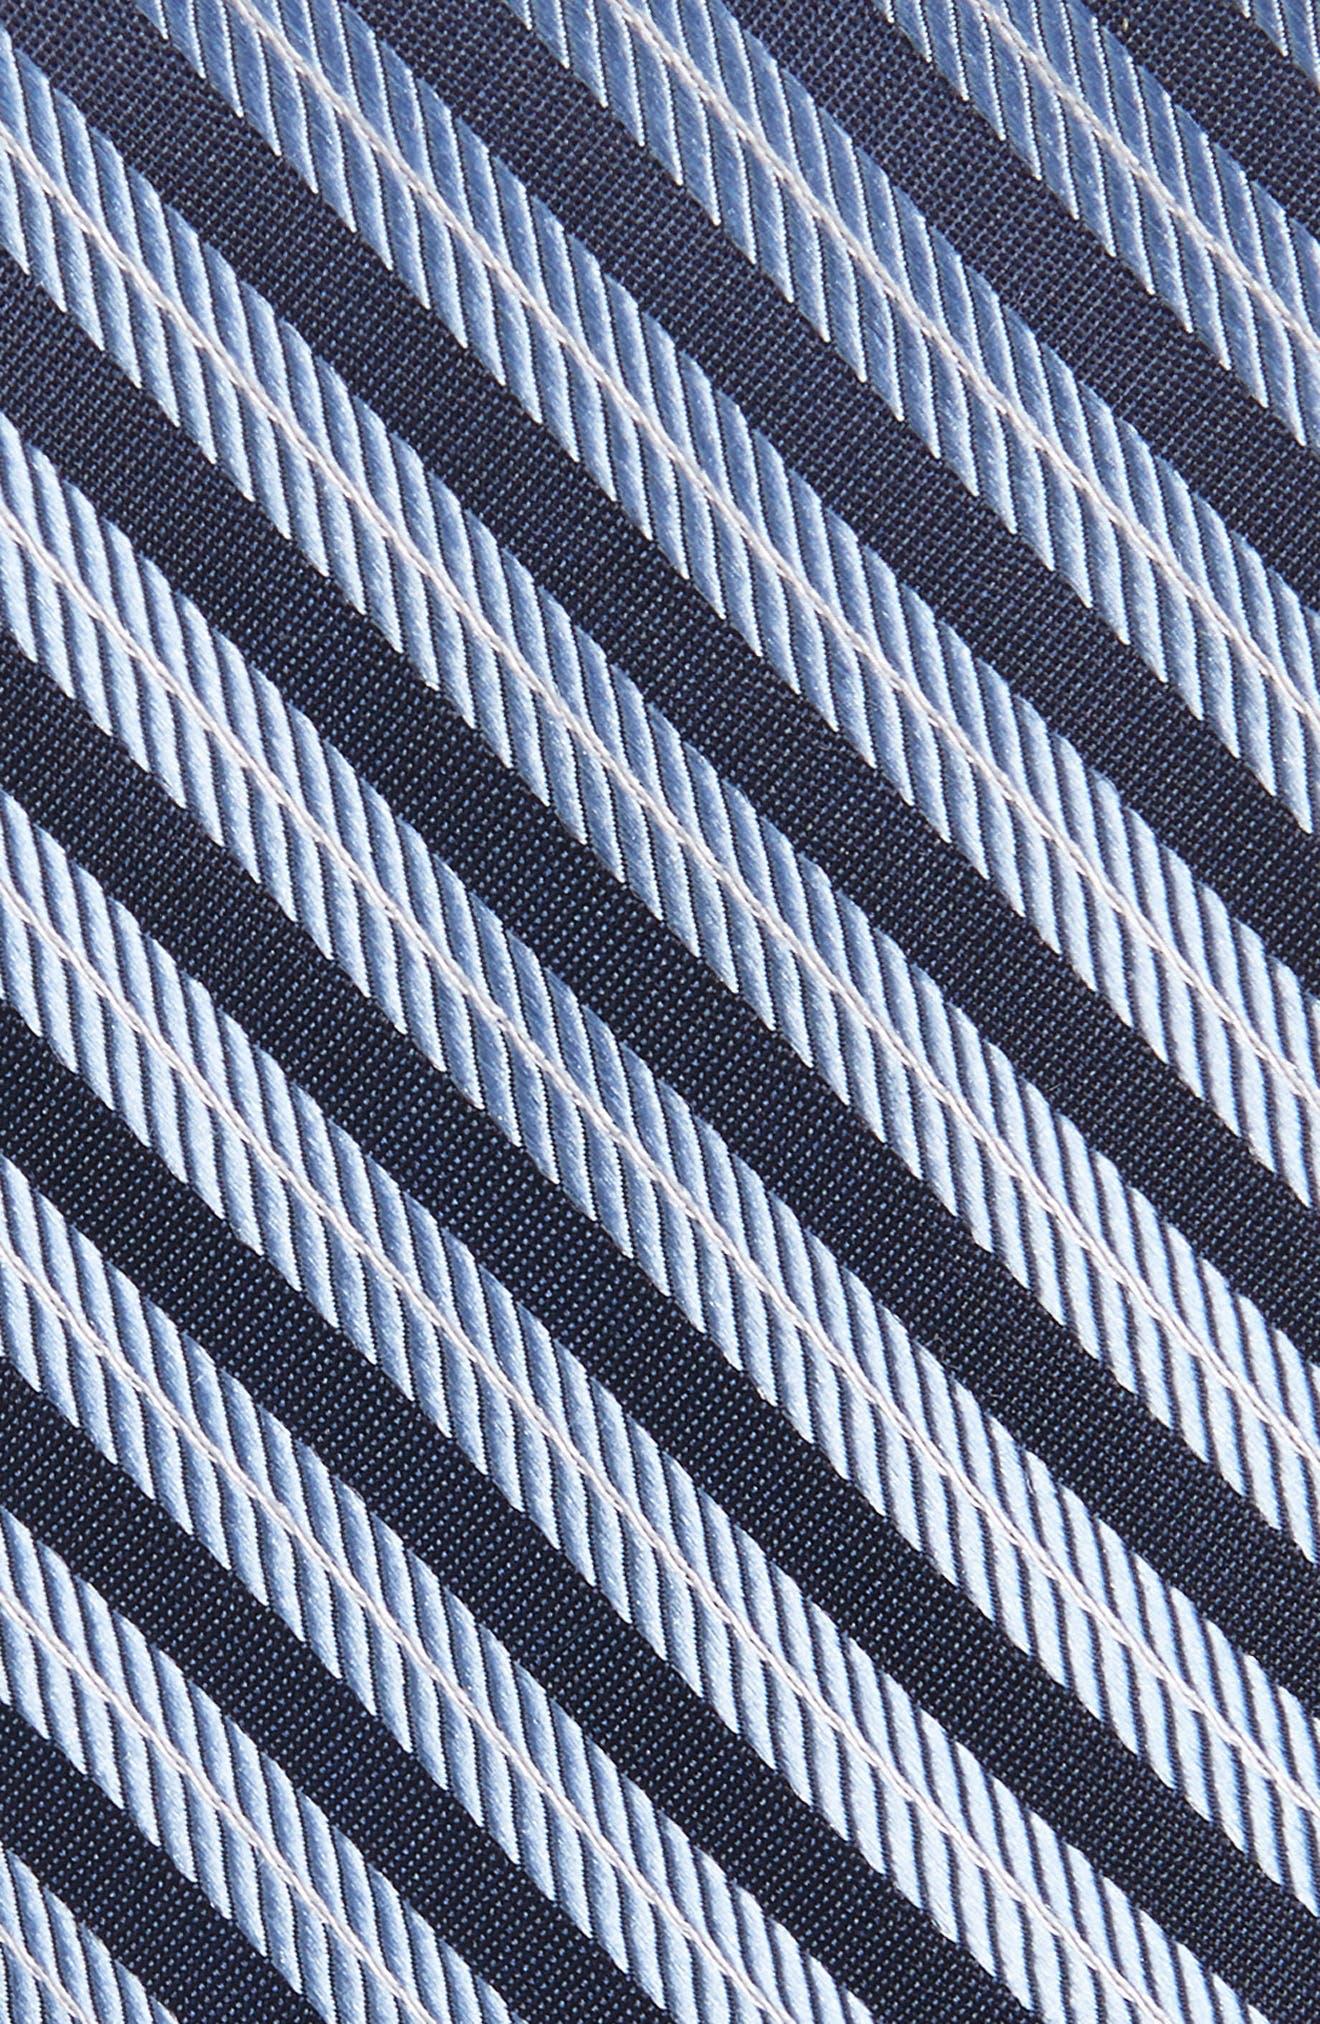 Milliner Stripe Silk Tie,                             Alternate thumbnail 2, color,                             Blue